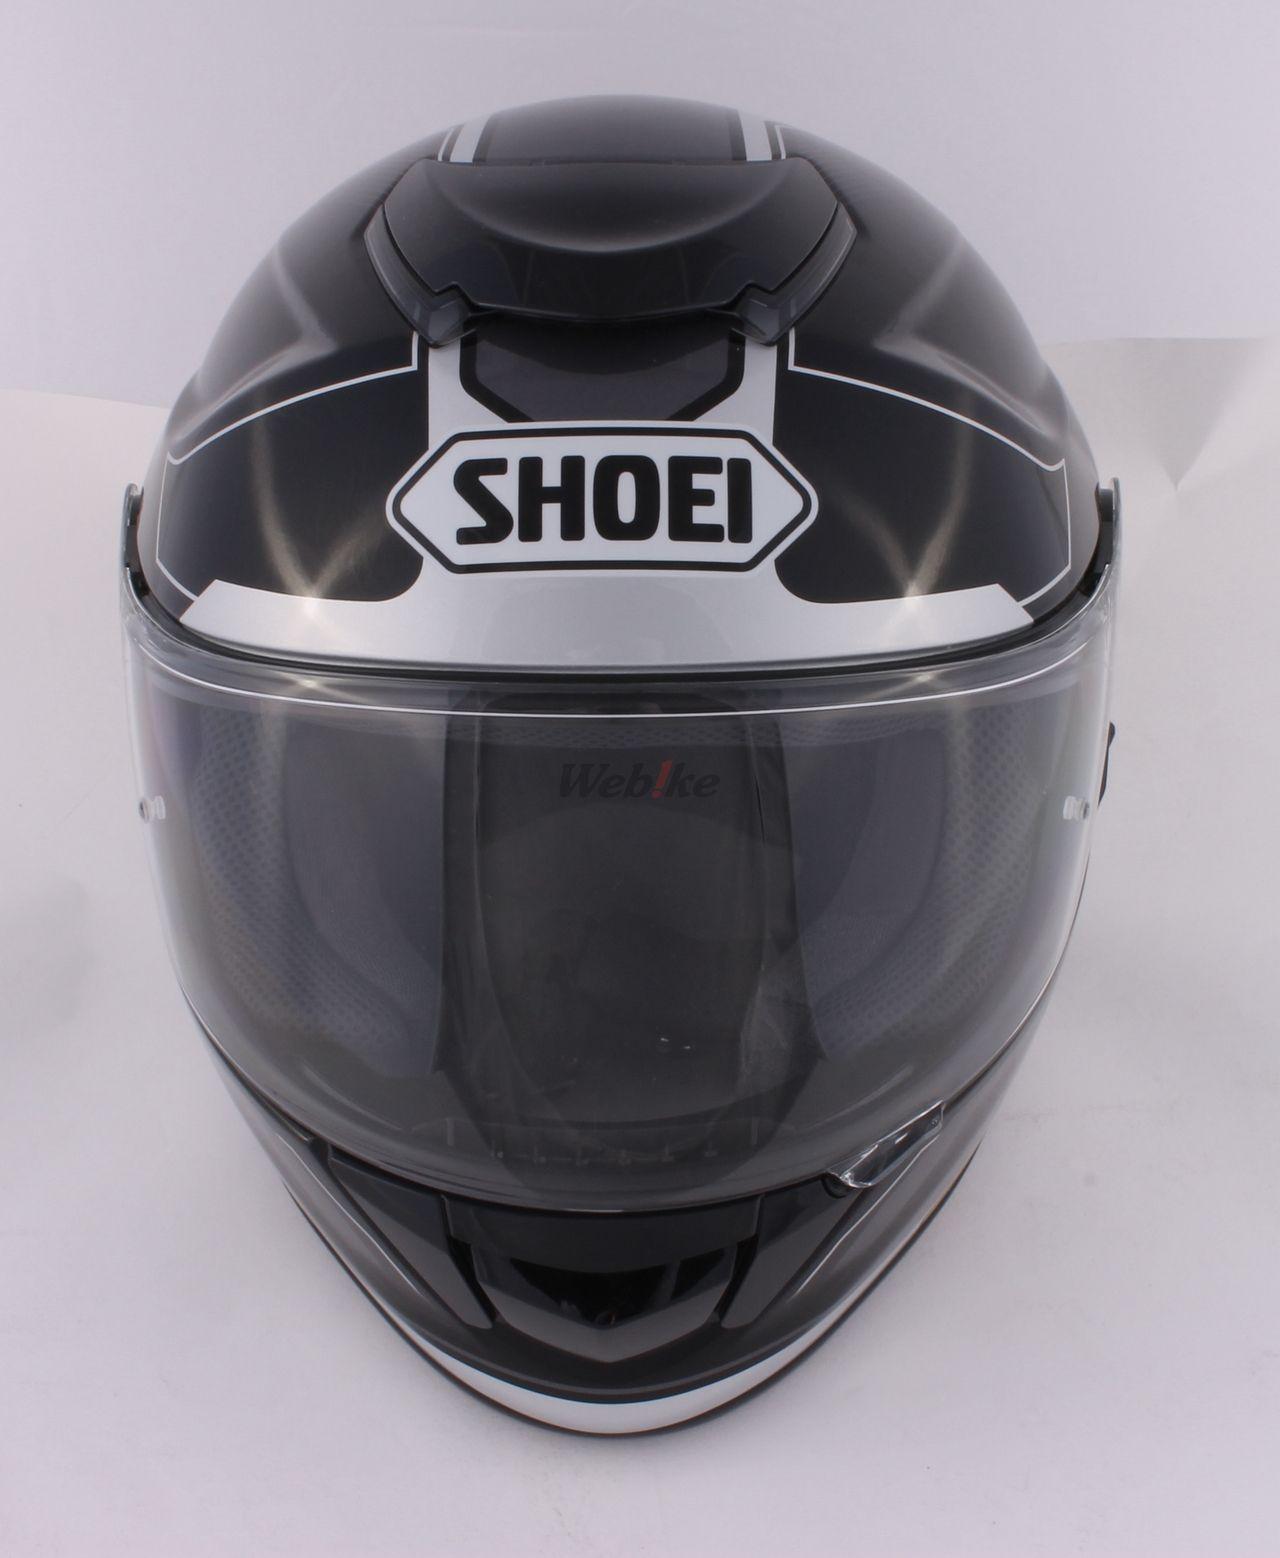 【SHOEI】GT-Air JOURNEY 全罩式安全帽 - 「Webike-摩托百貨」